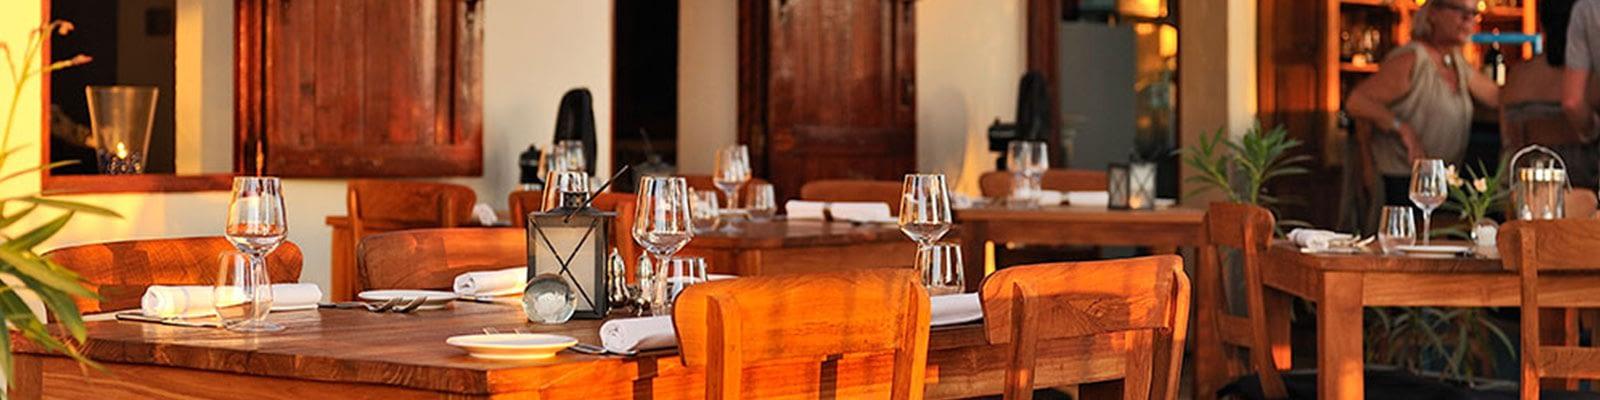 At-Sea-Restaurant-Bonaire-sliderimage-3.jpg